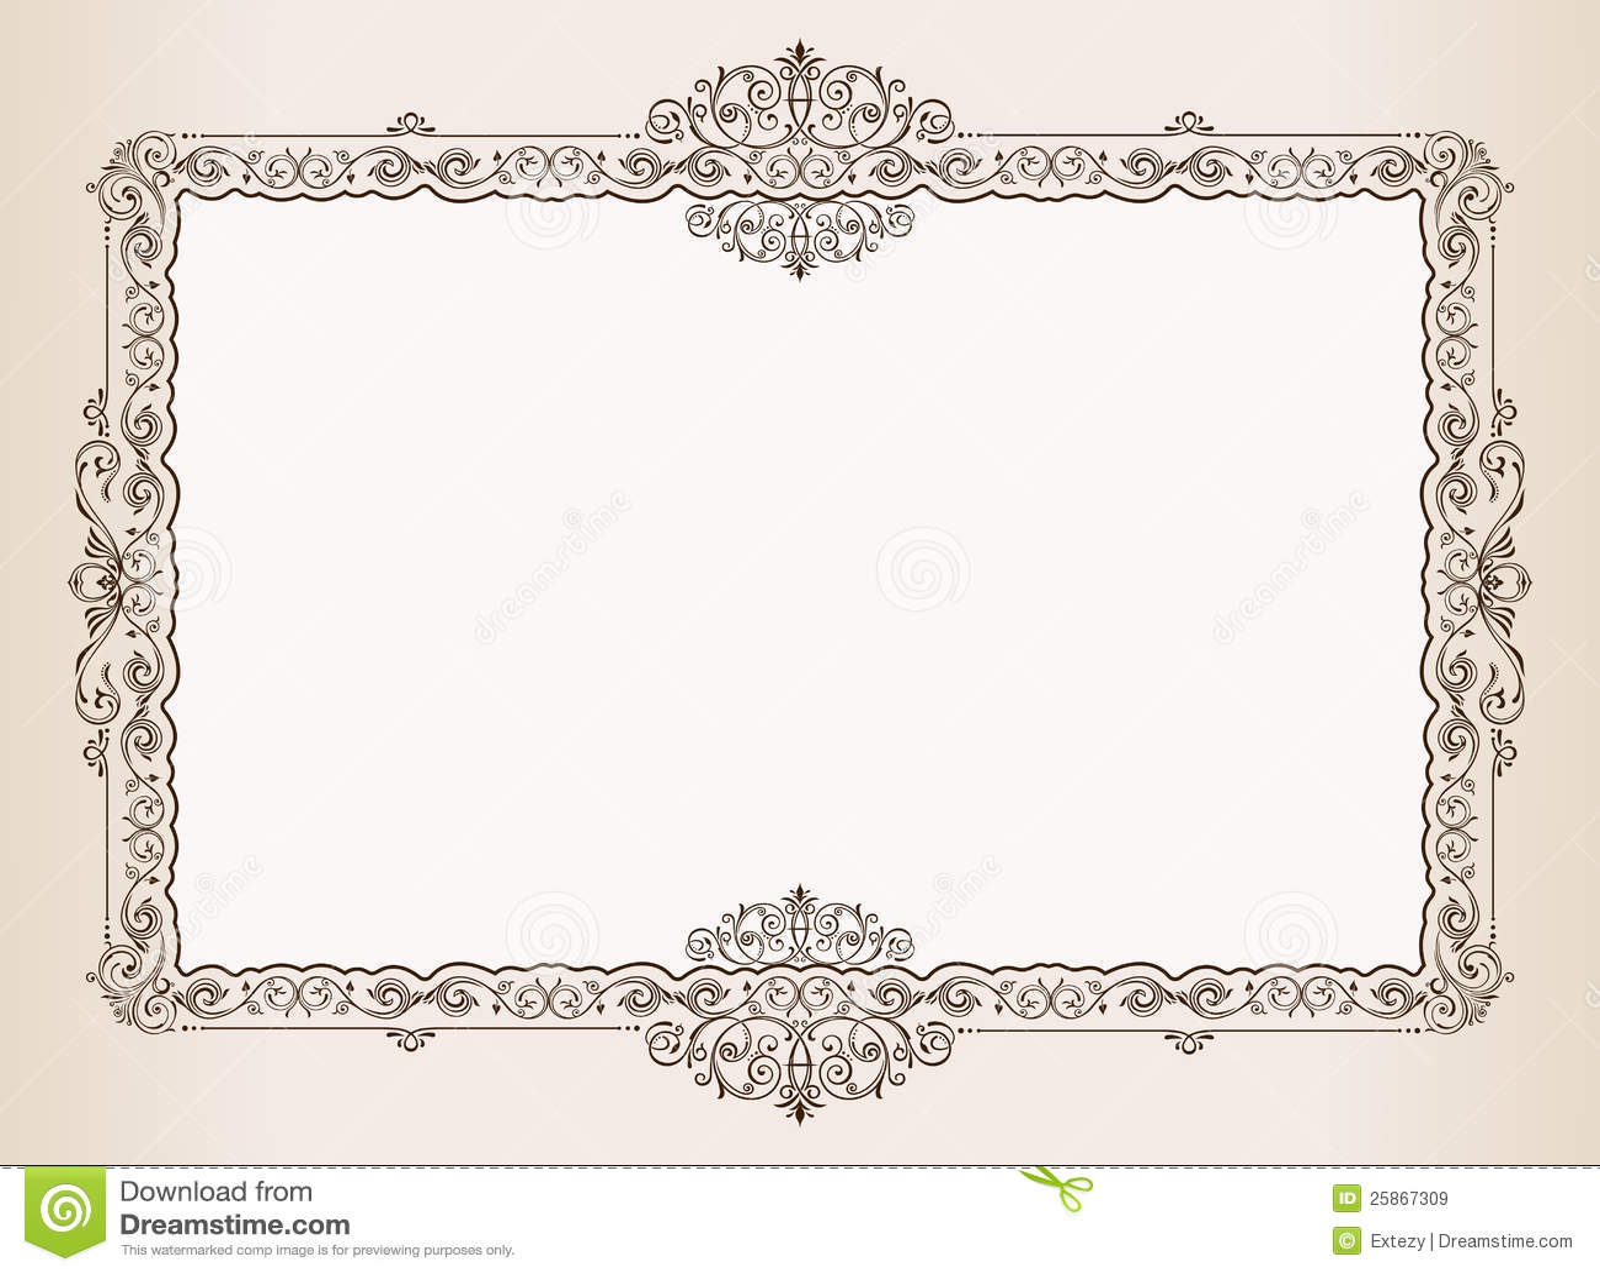 vector vintage frame ornaments royal document